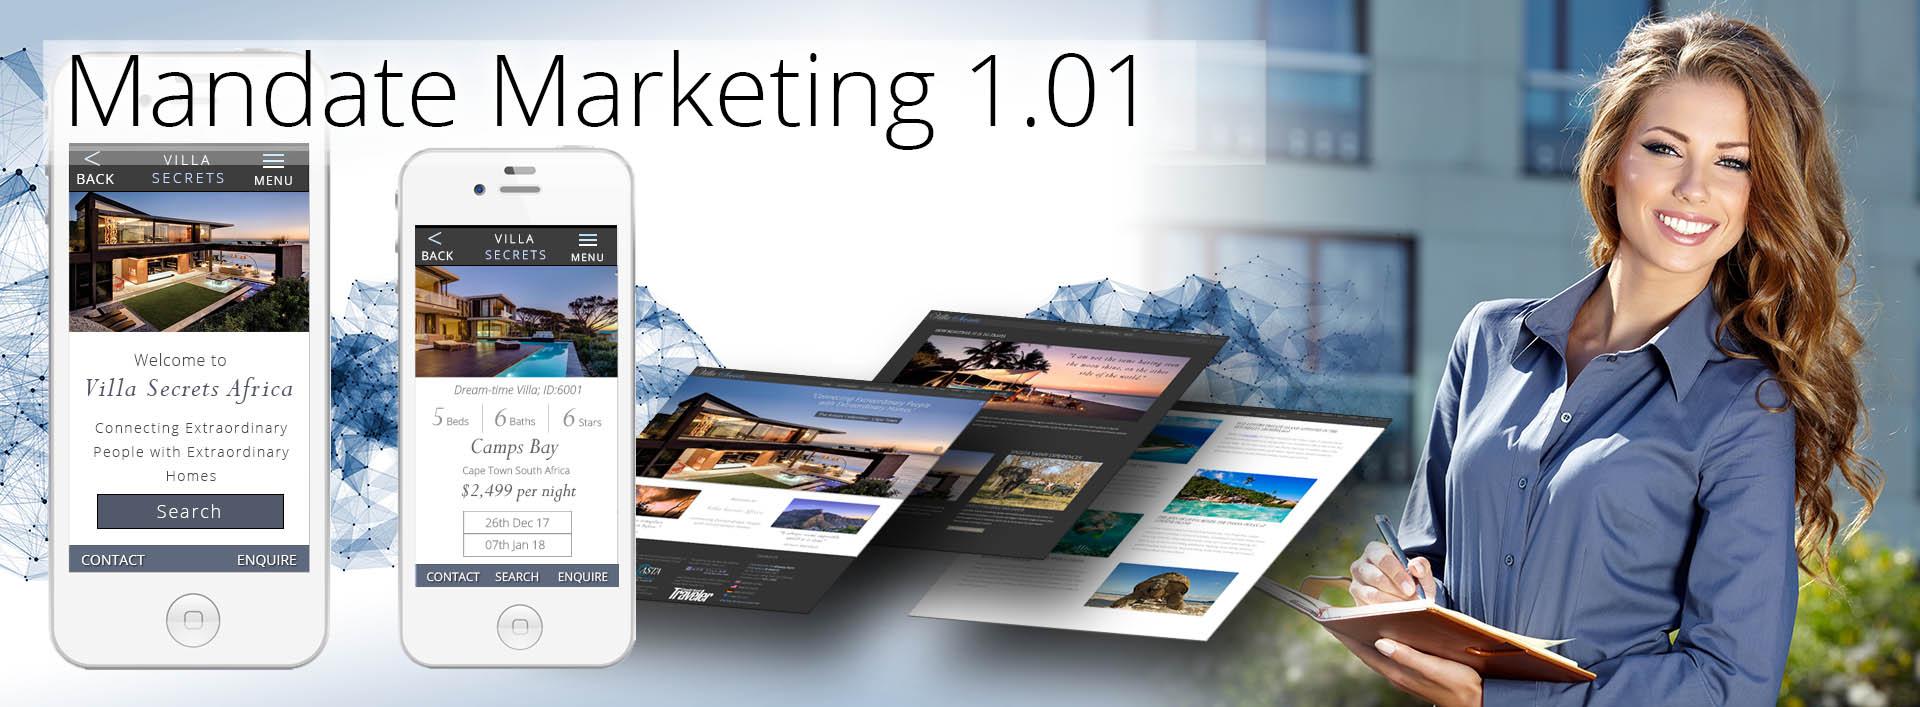 mandate-marketing